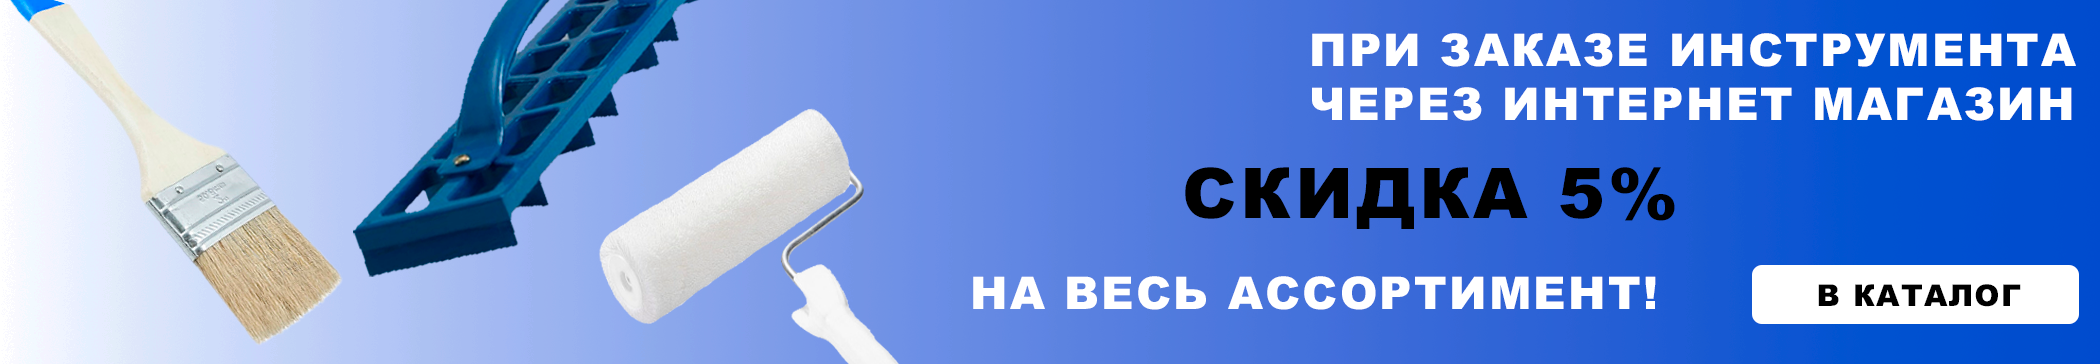 https://st-perm.ru/image/catalog/sales/sales_2.png